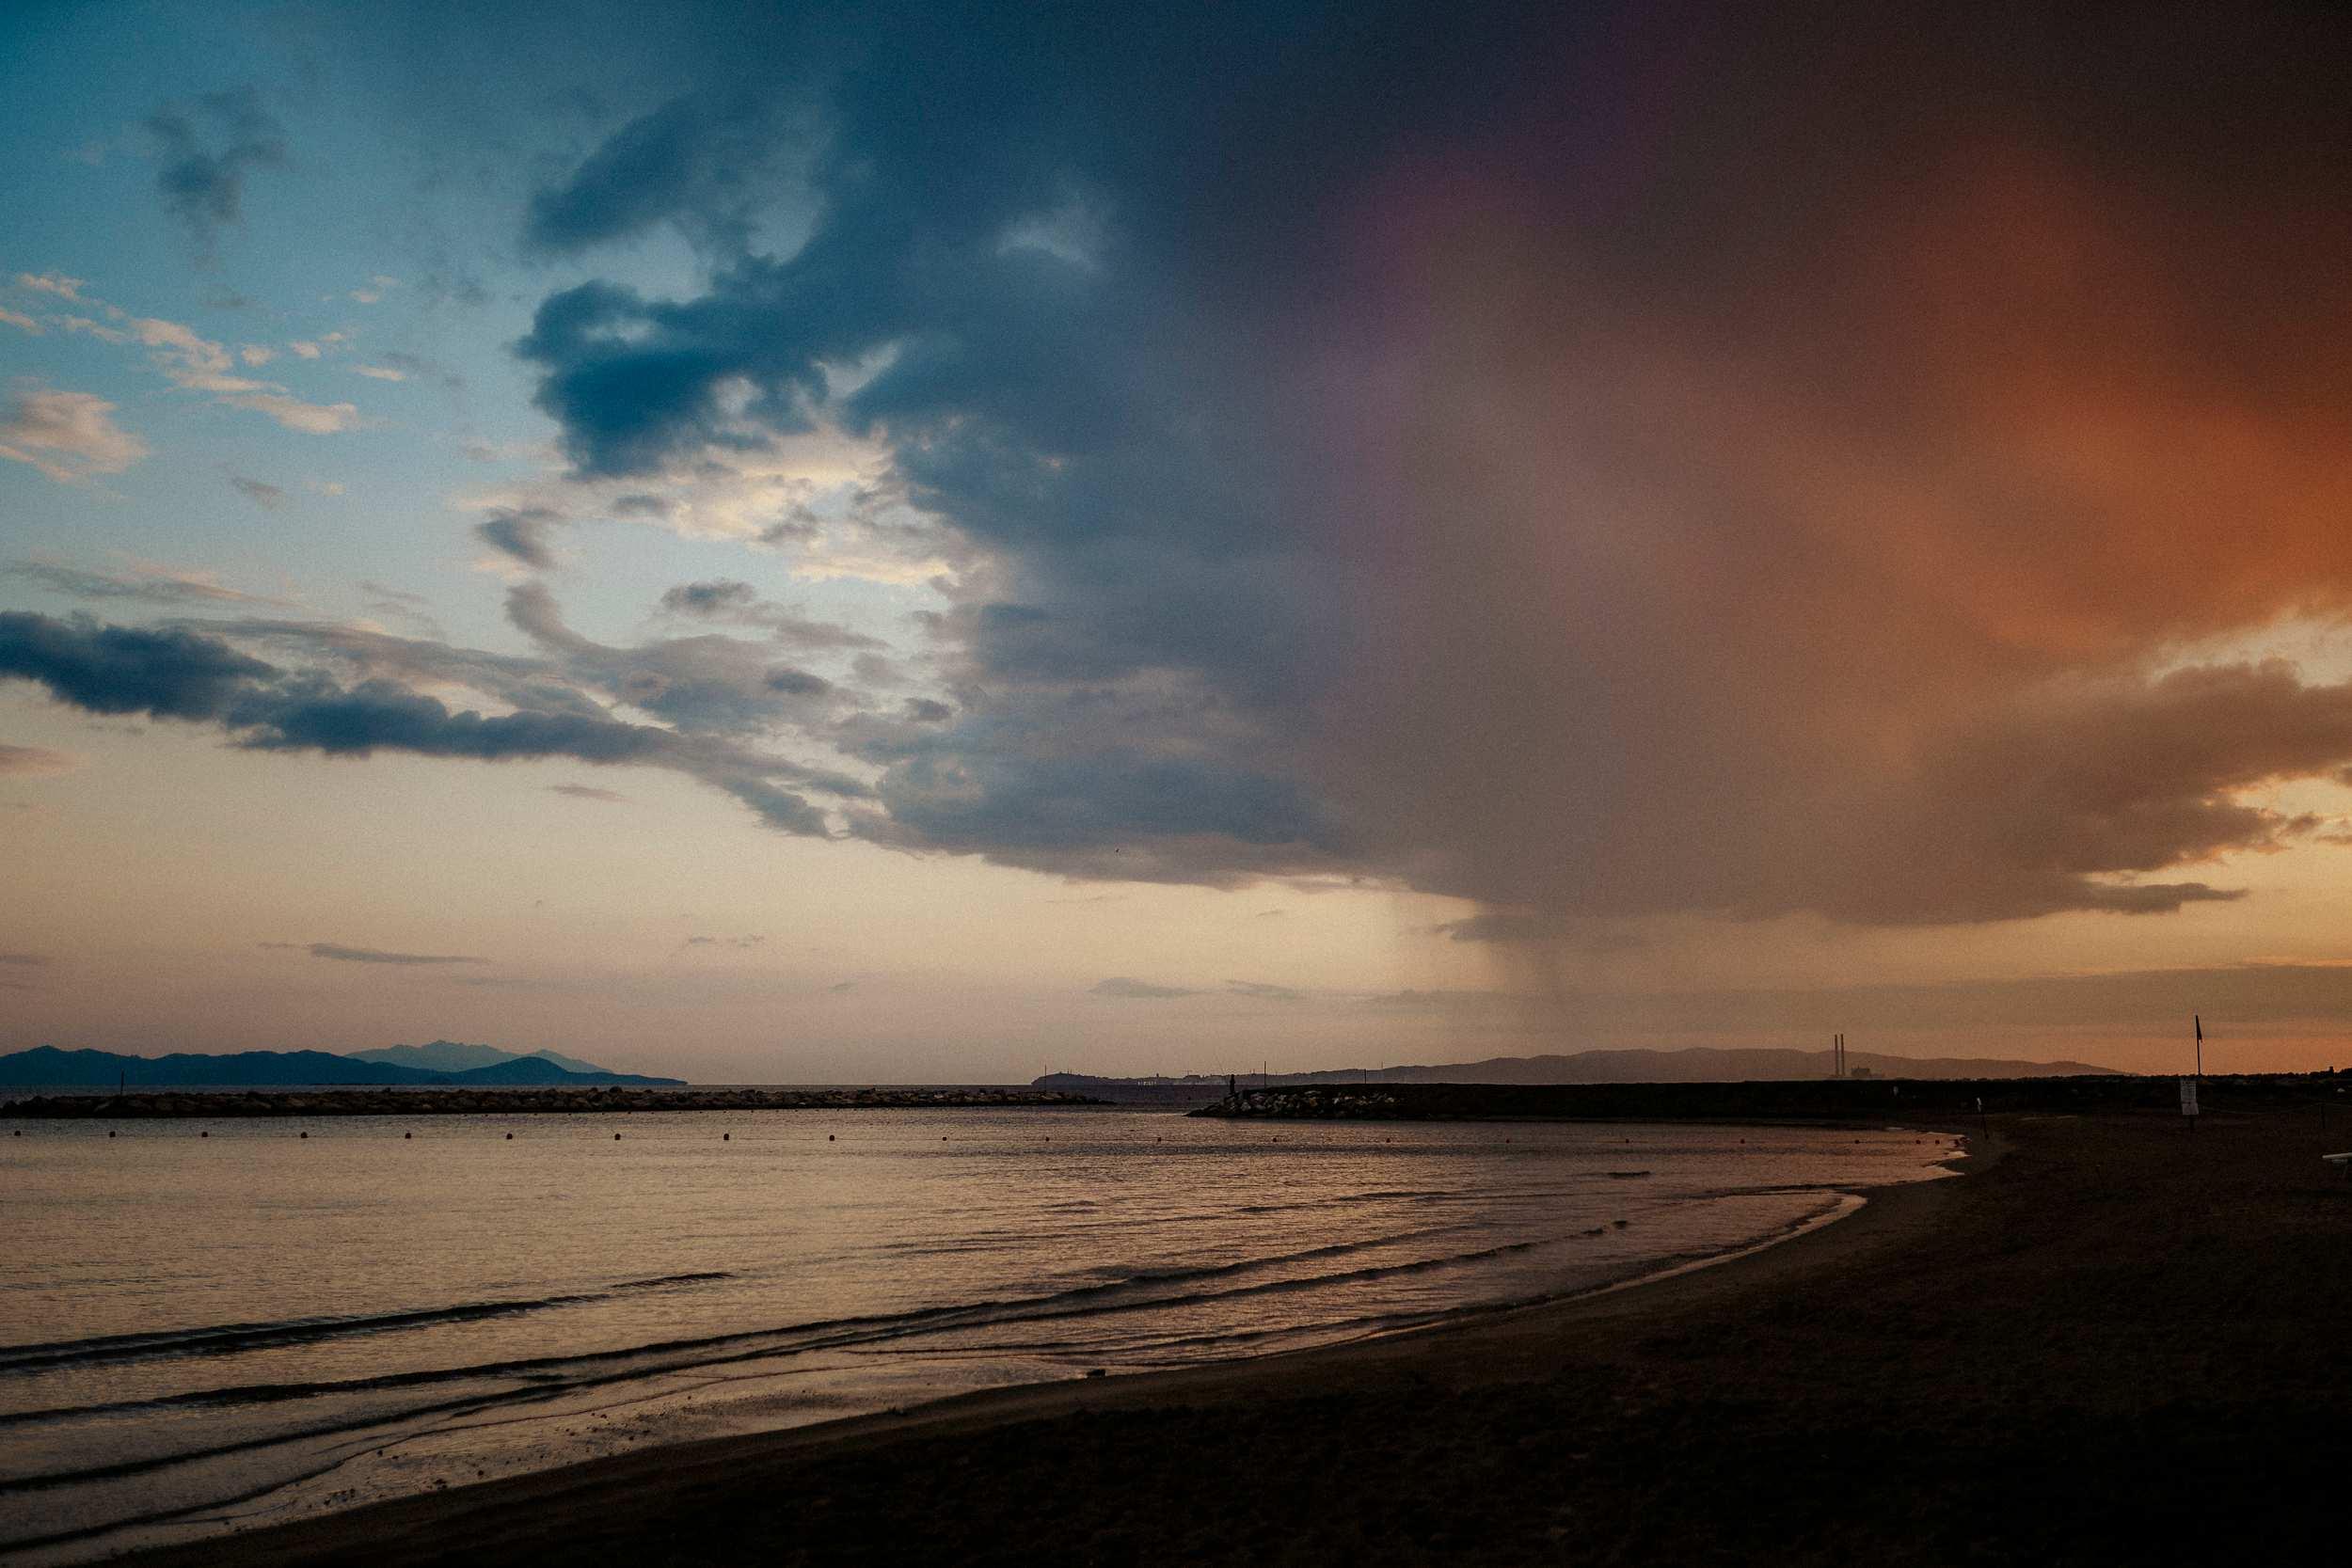 paesaggio matrimonio in spiaggia